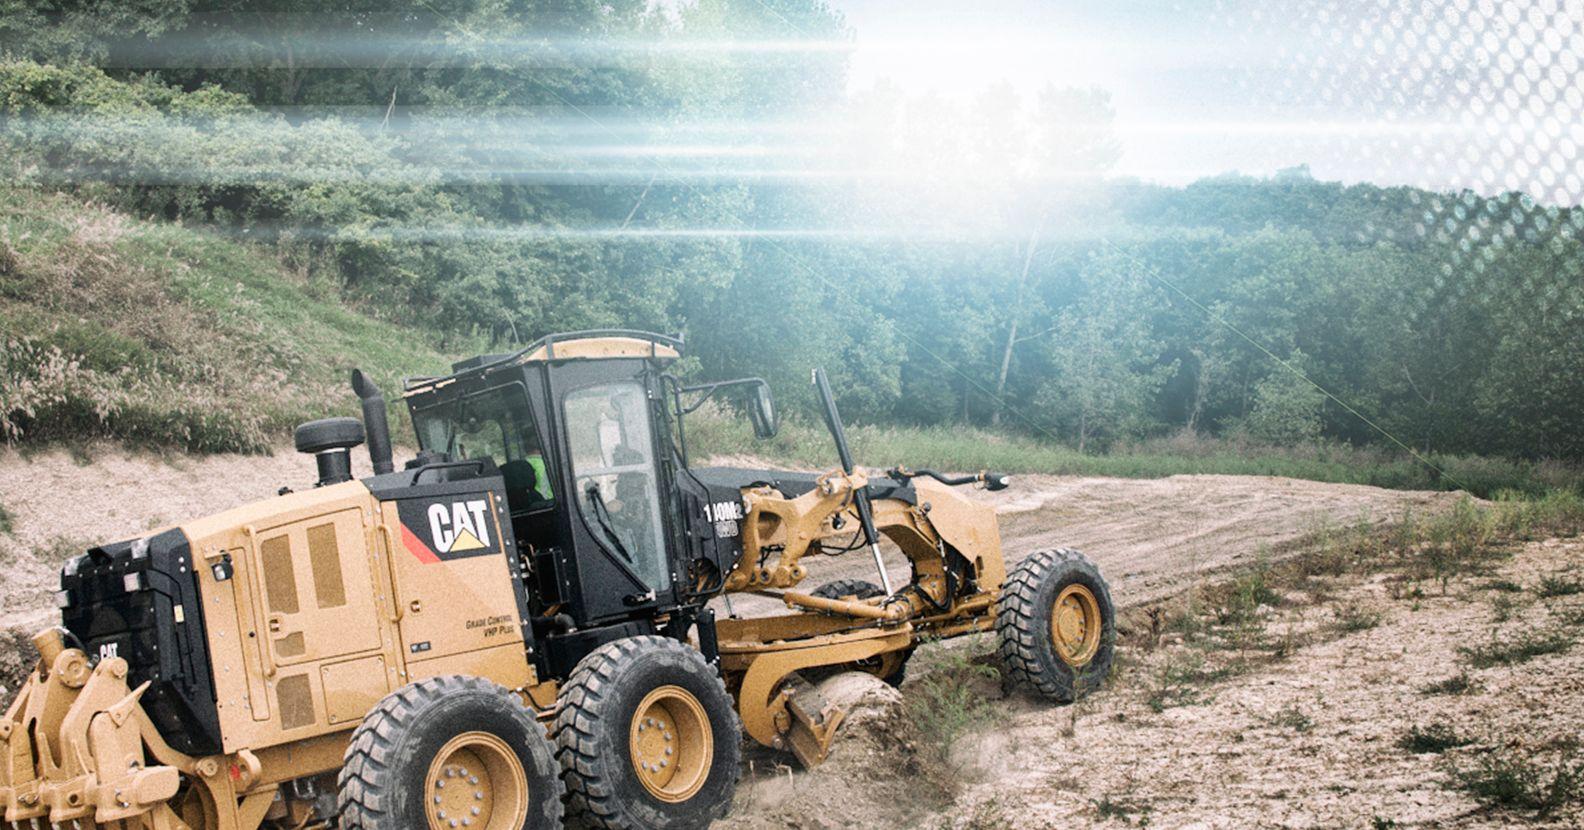 Caterpillar 555D - skidder - Forestry Equipment ...   Cat Forestry Equipment